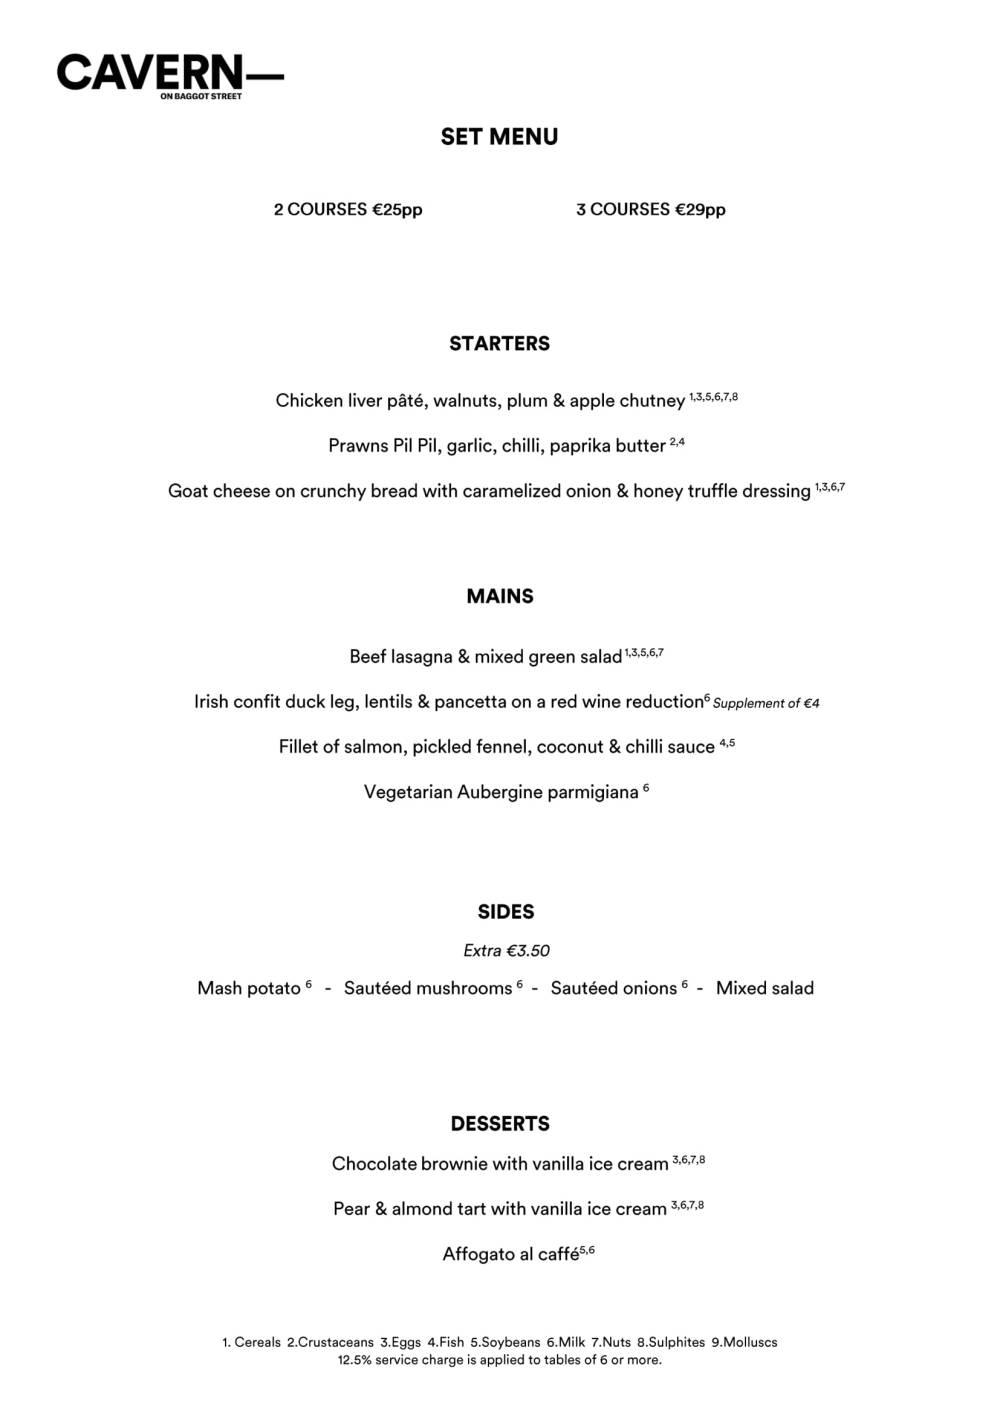 Set menu May 2018-1.jpg